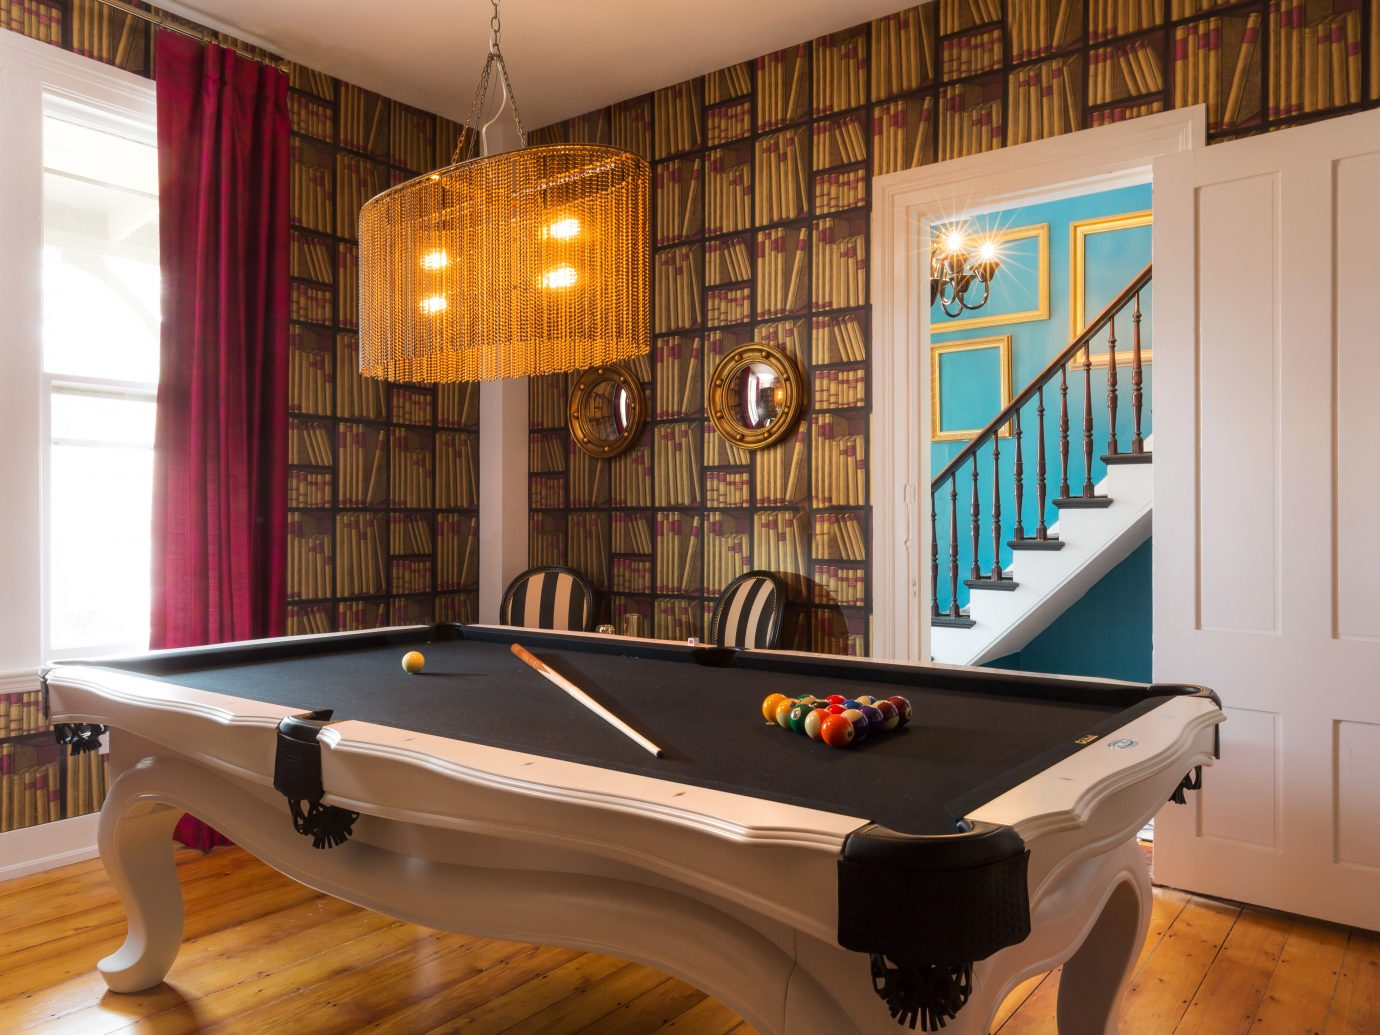 Boutique Budget Hip Hotels Living indoor floor recreation room billiard room room billiard table hardwood interior design estate games table basement real estate